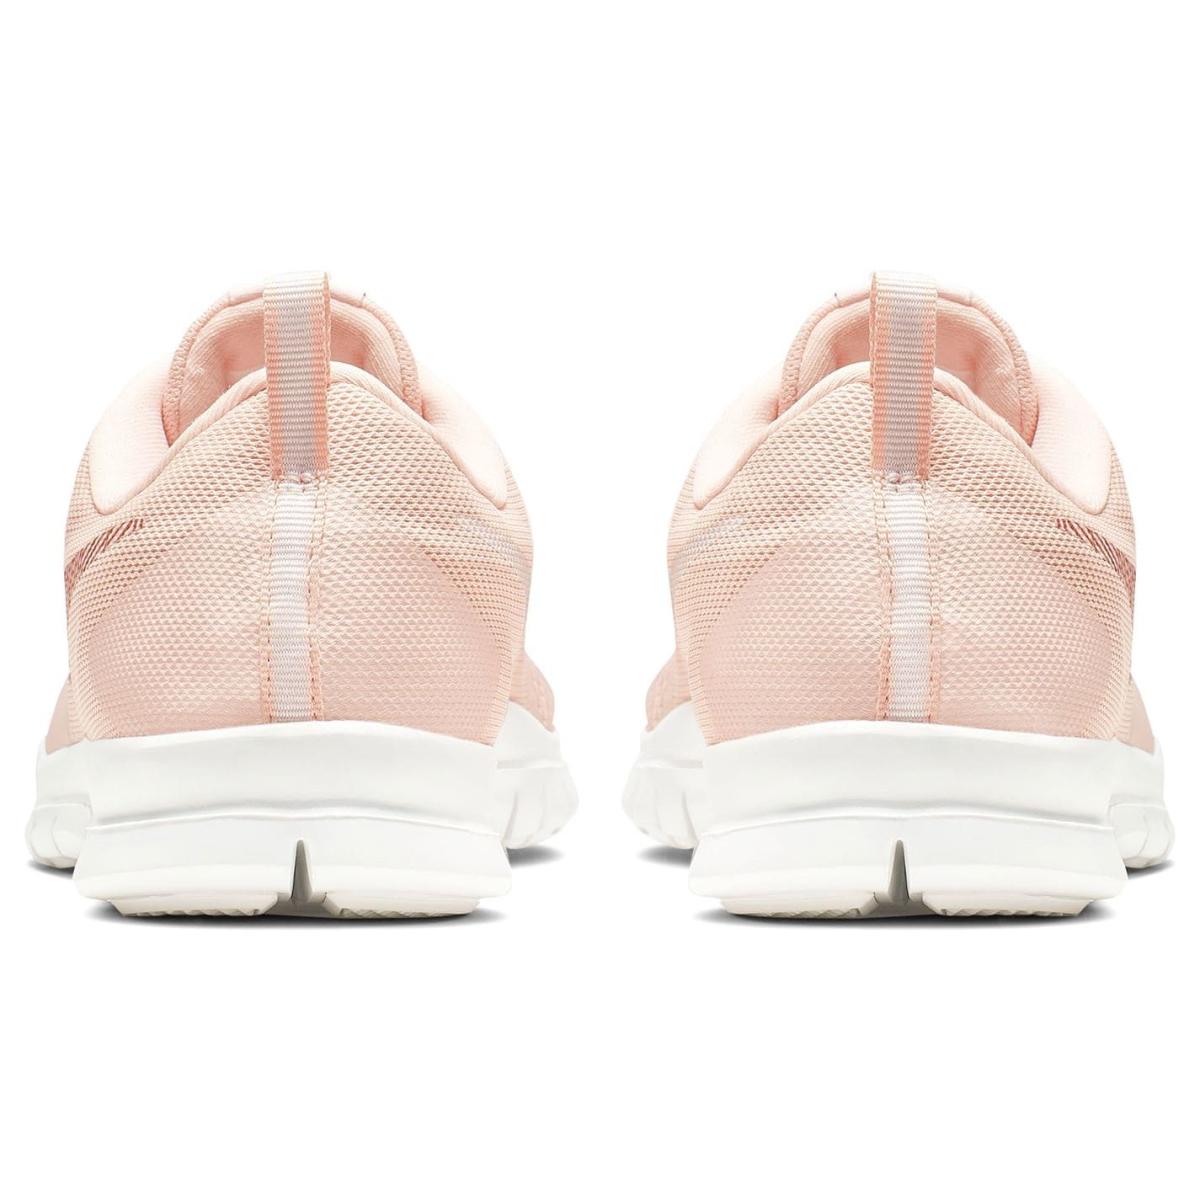 Nike-Flex-Laufschuhe-Turnschuhe-Damen-Sneaker-Sportschuhe-Jogging-3088 Indexbild 20